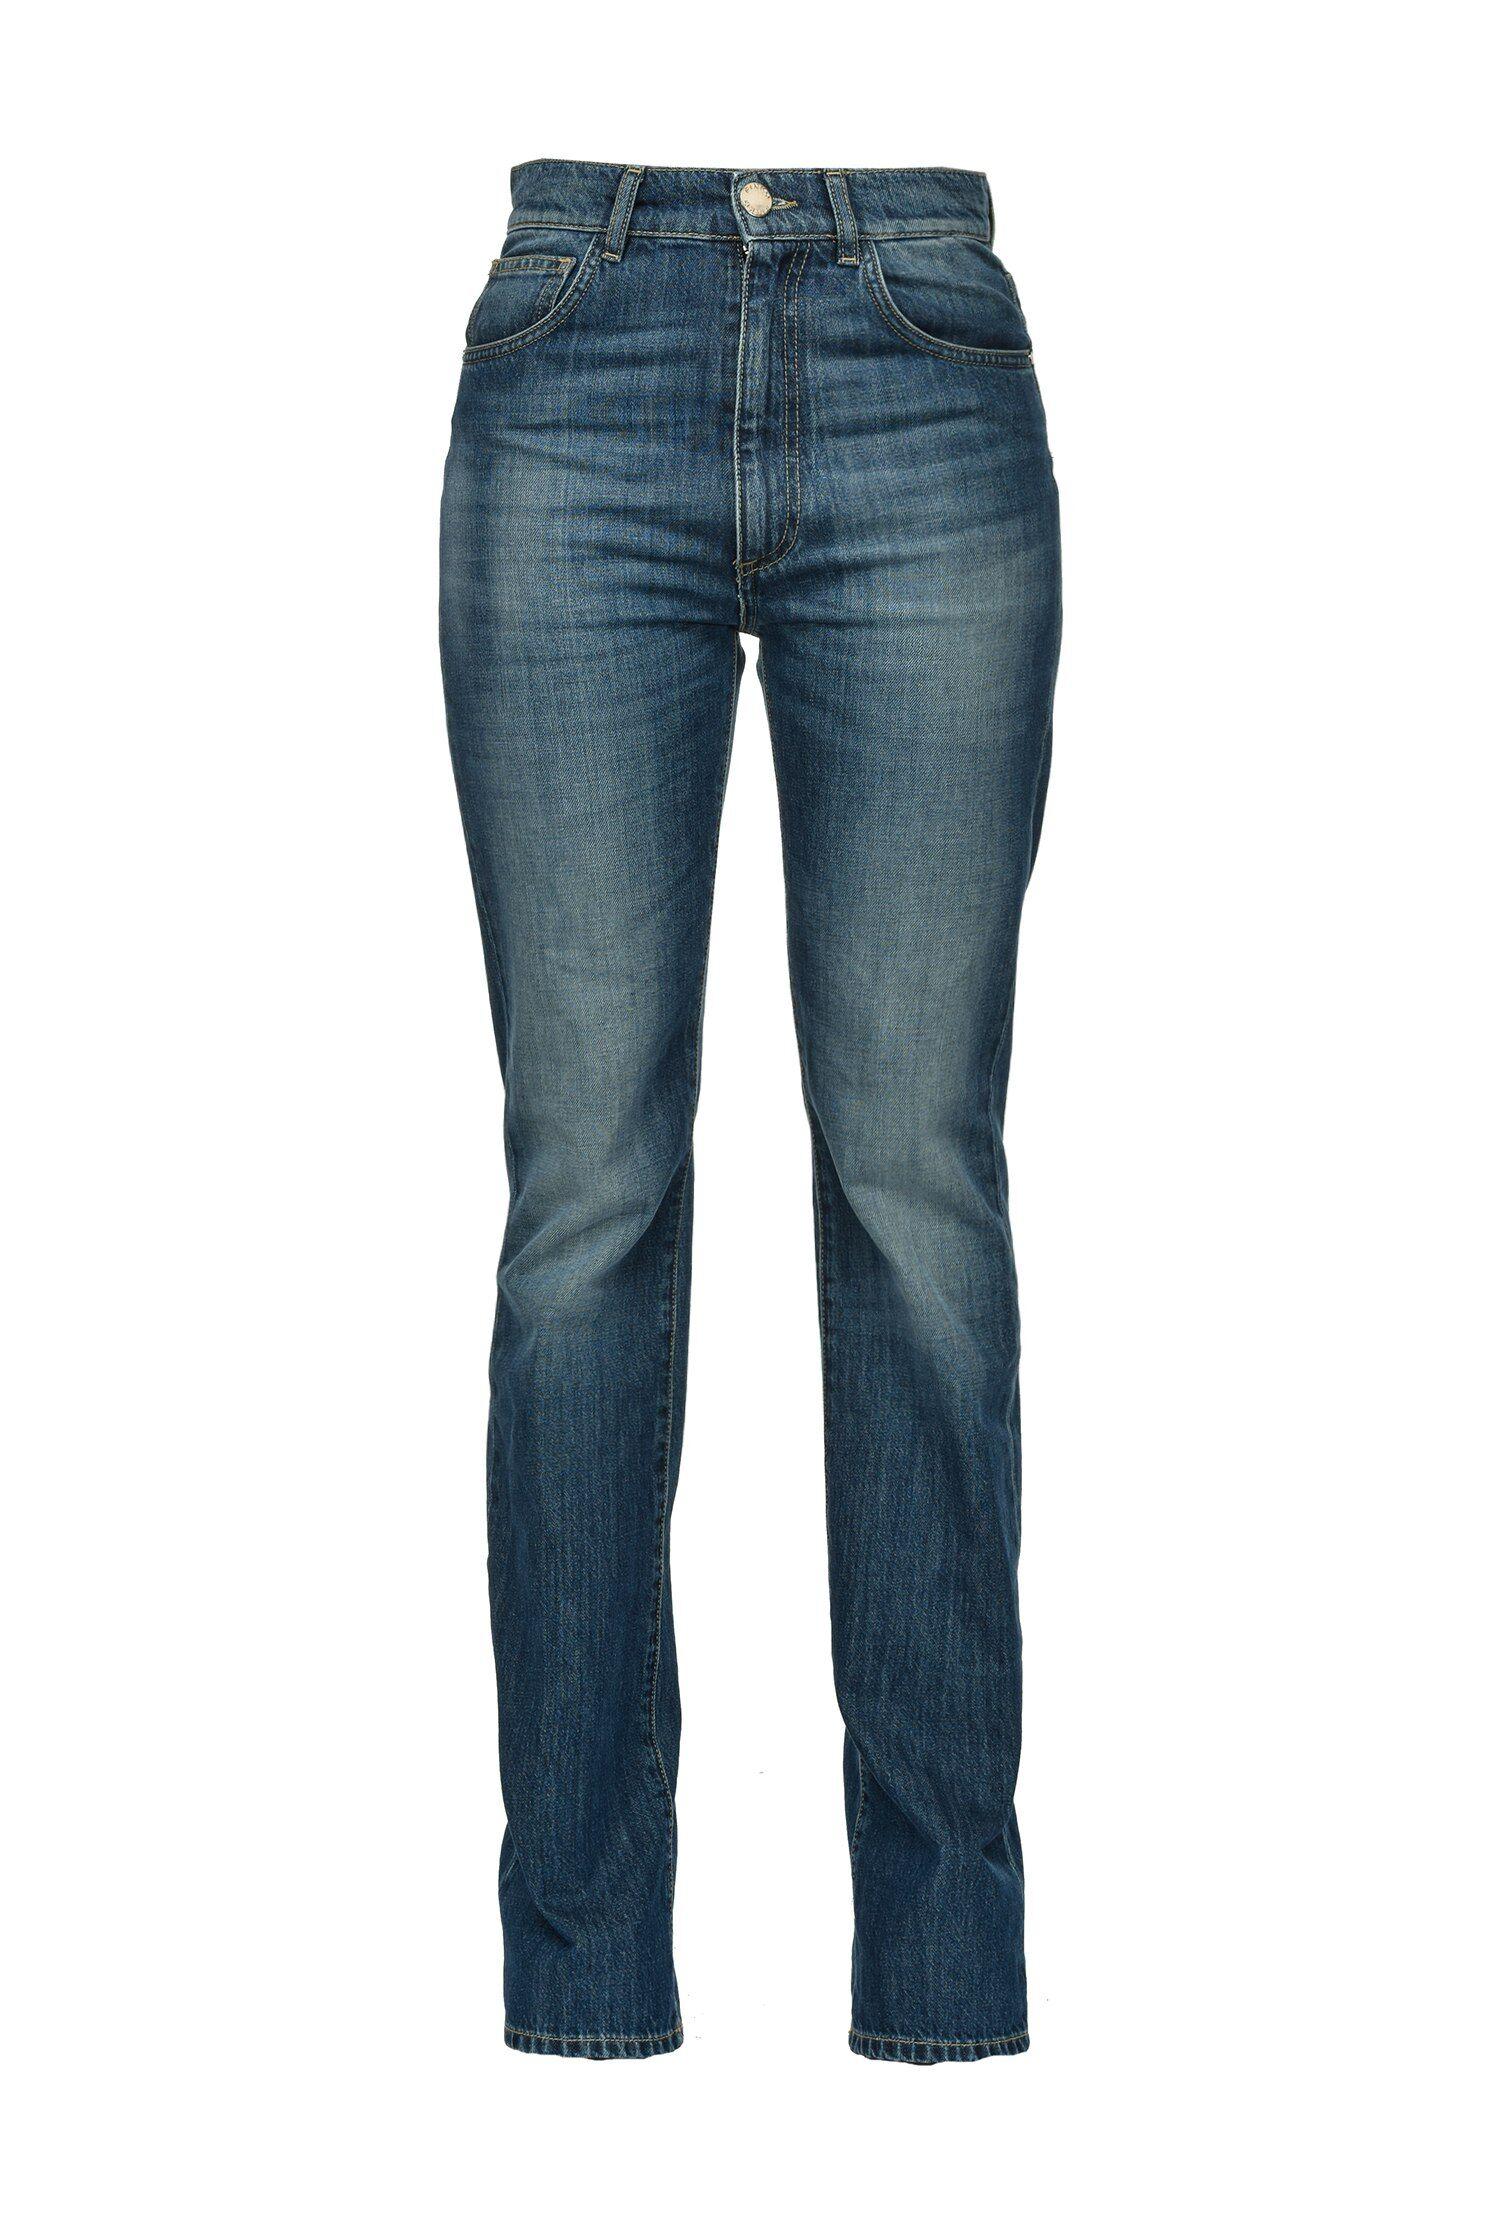 Jeans Straight In Denim Blue Stretch - Pinko